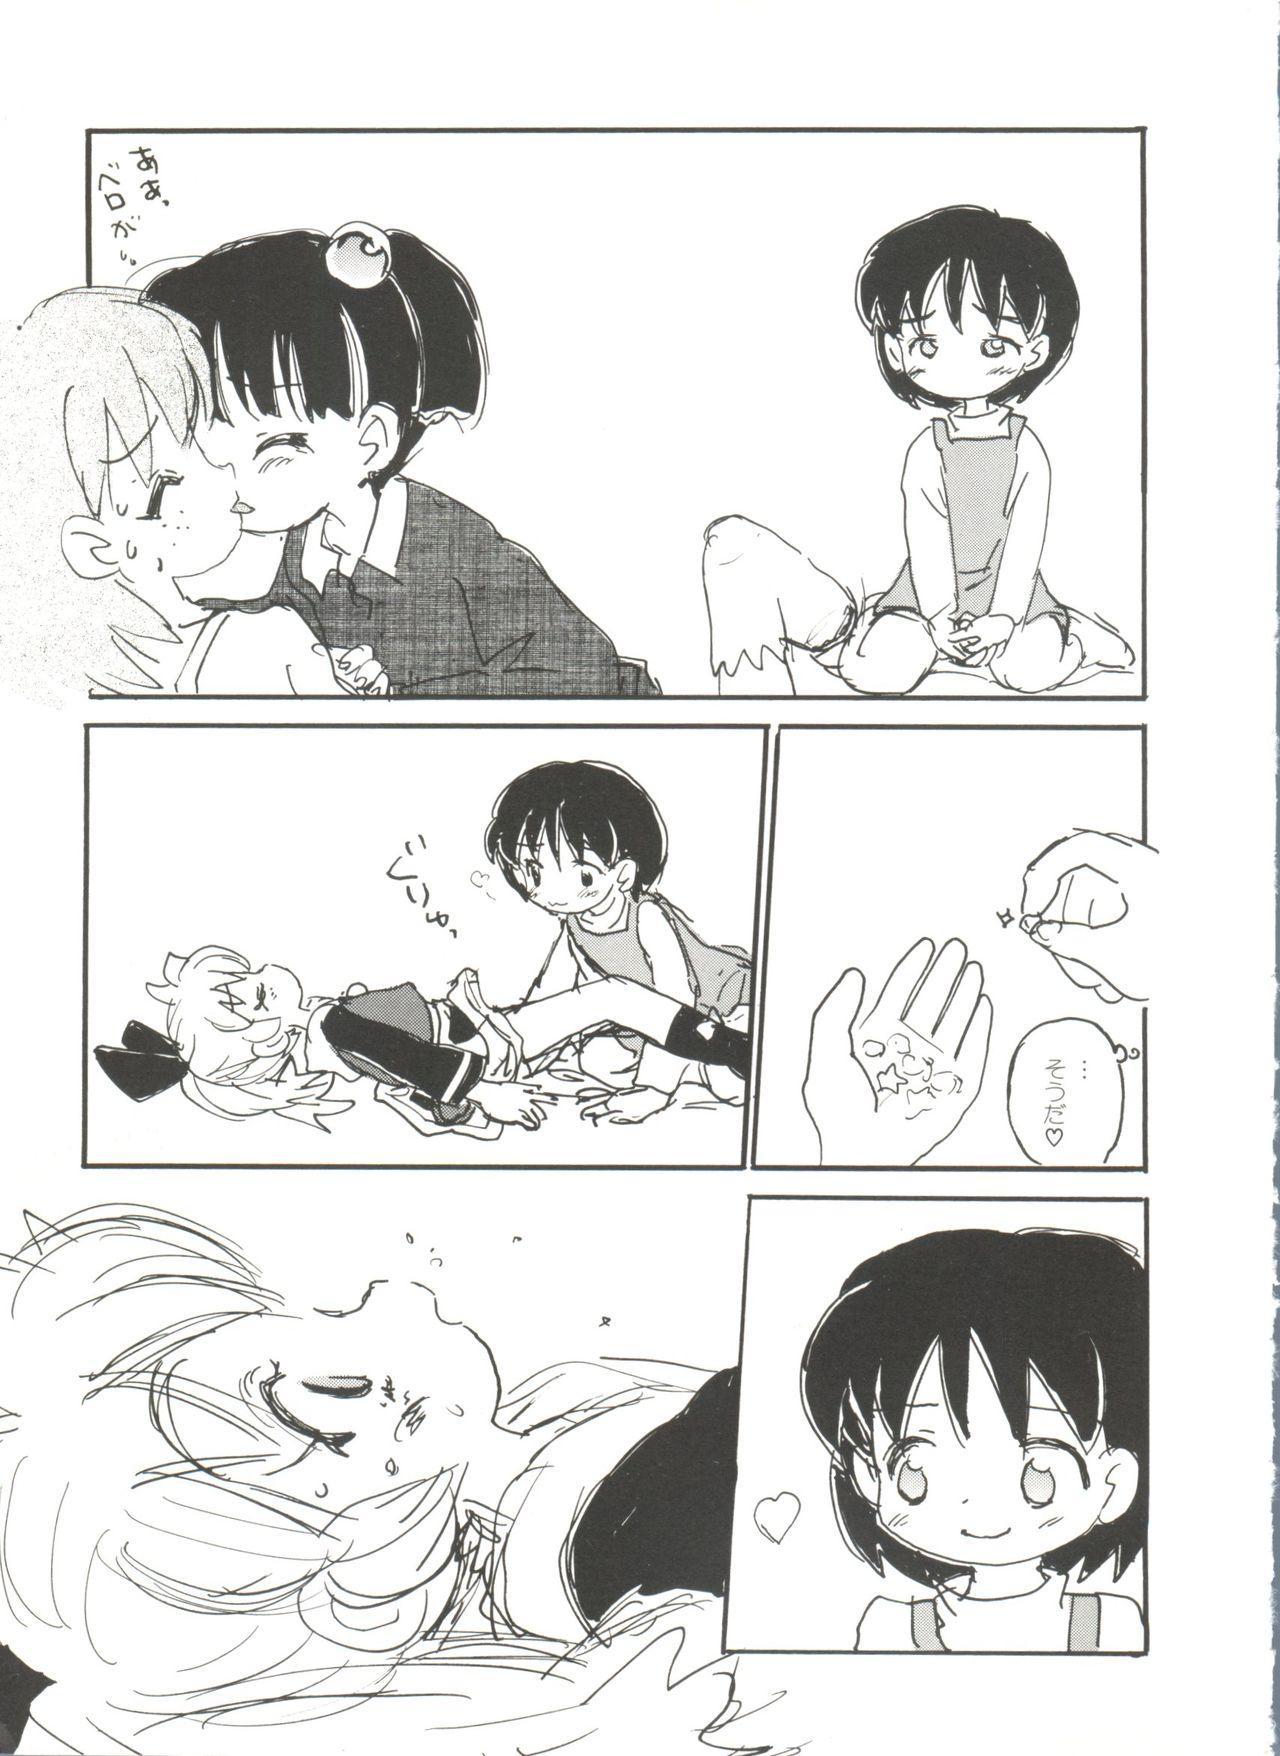 [Anthology] Denei Tamatebako 8 - Utakata no Tenshi-tachi II (Various) 26